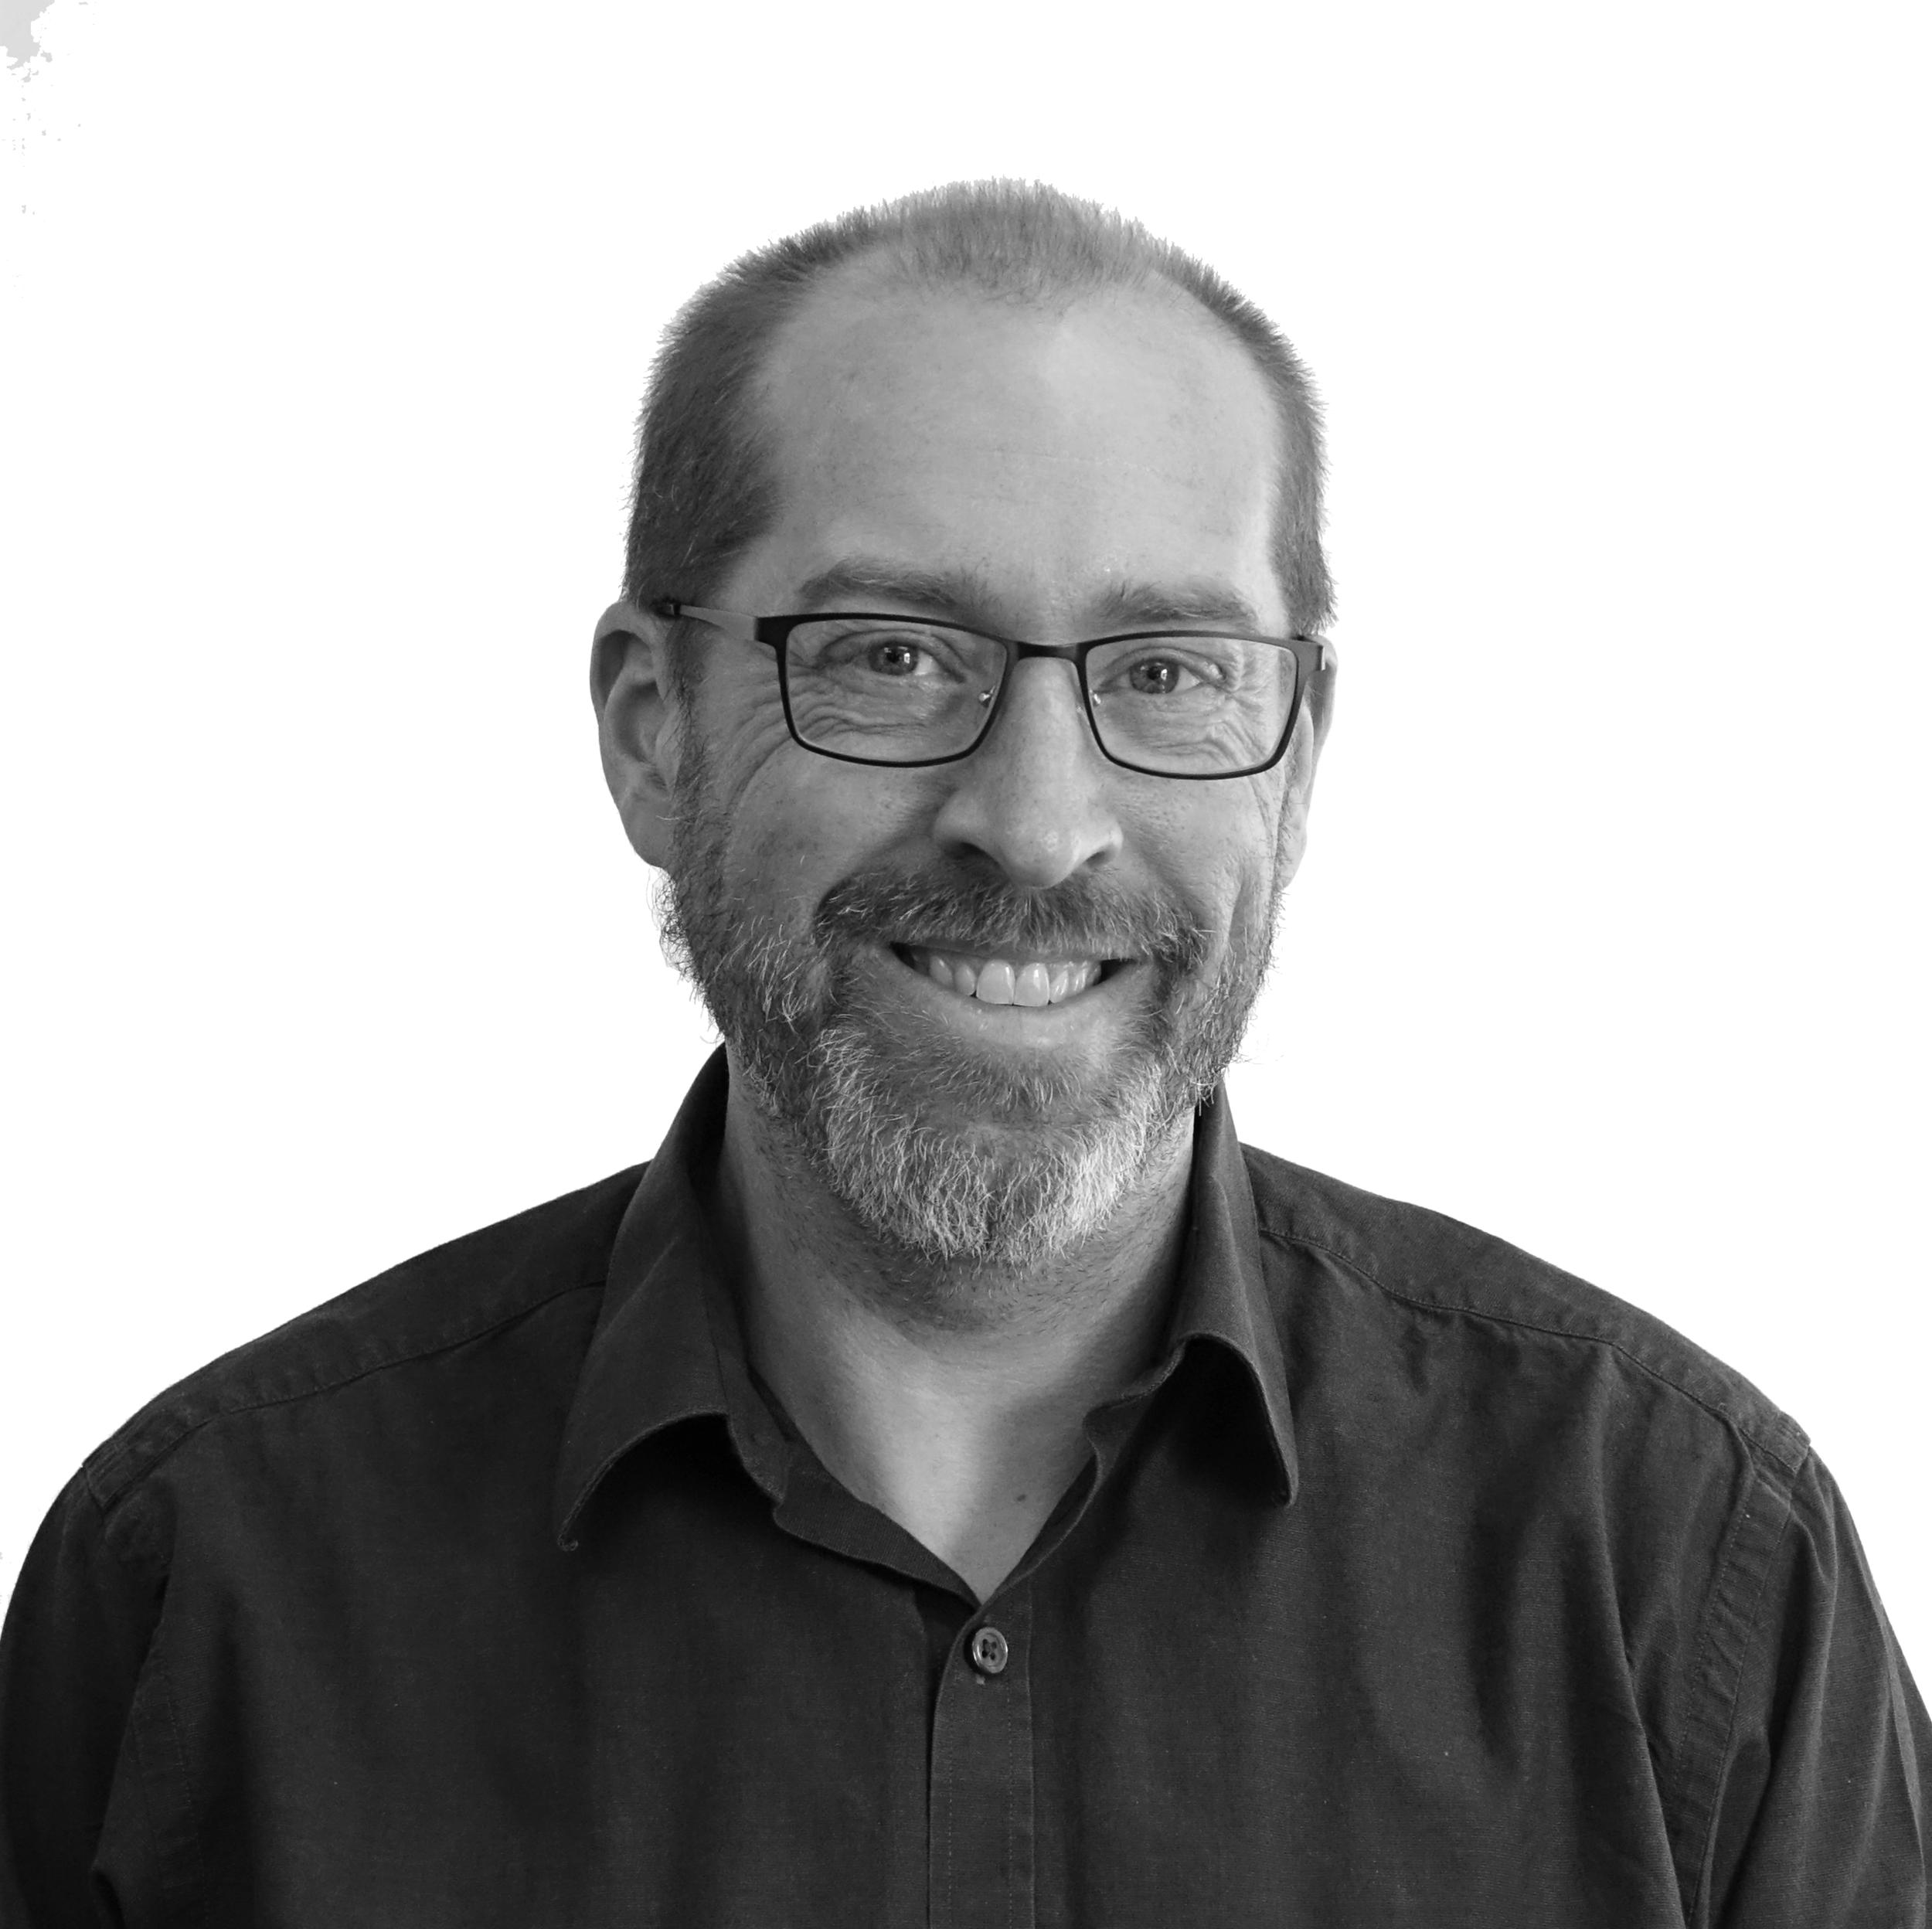 Marc Marino - Associate Software Engineer